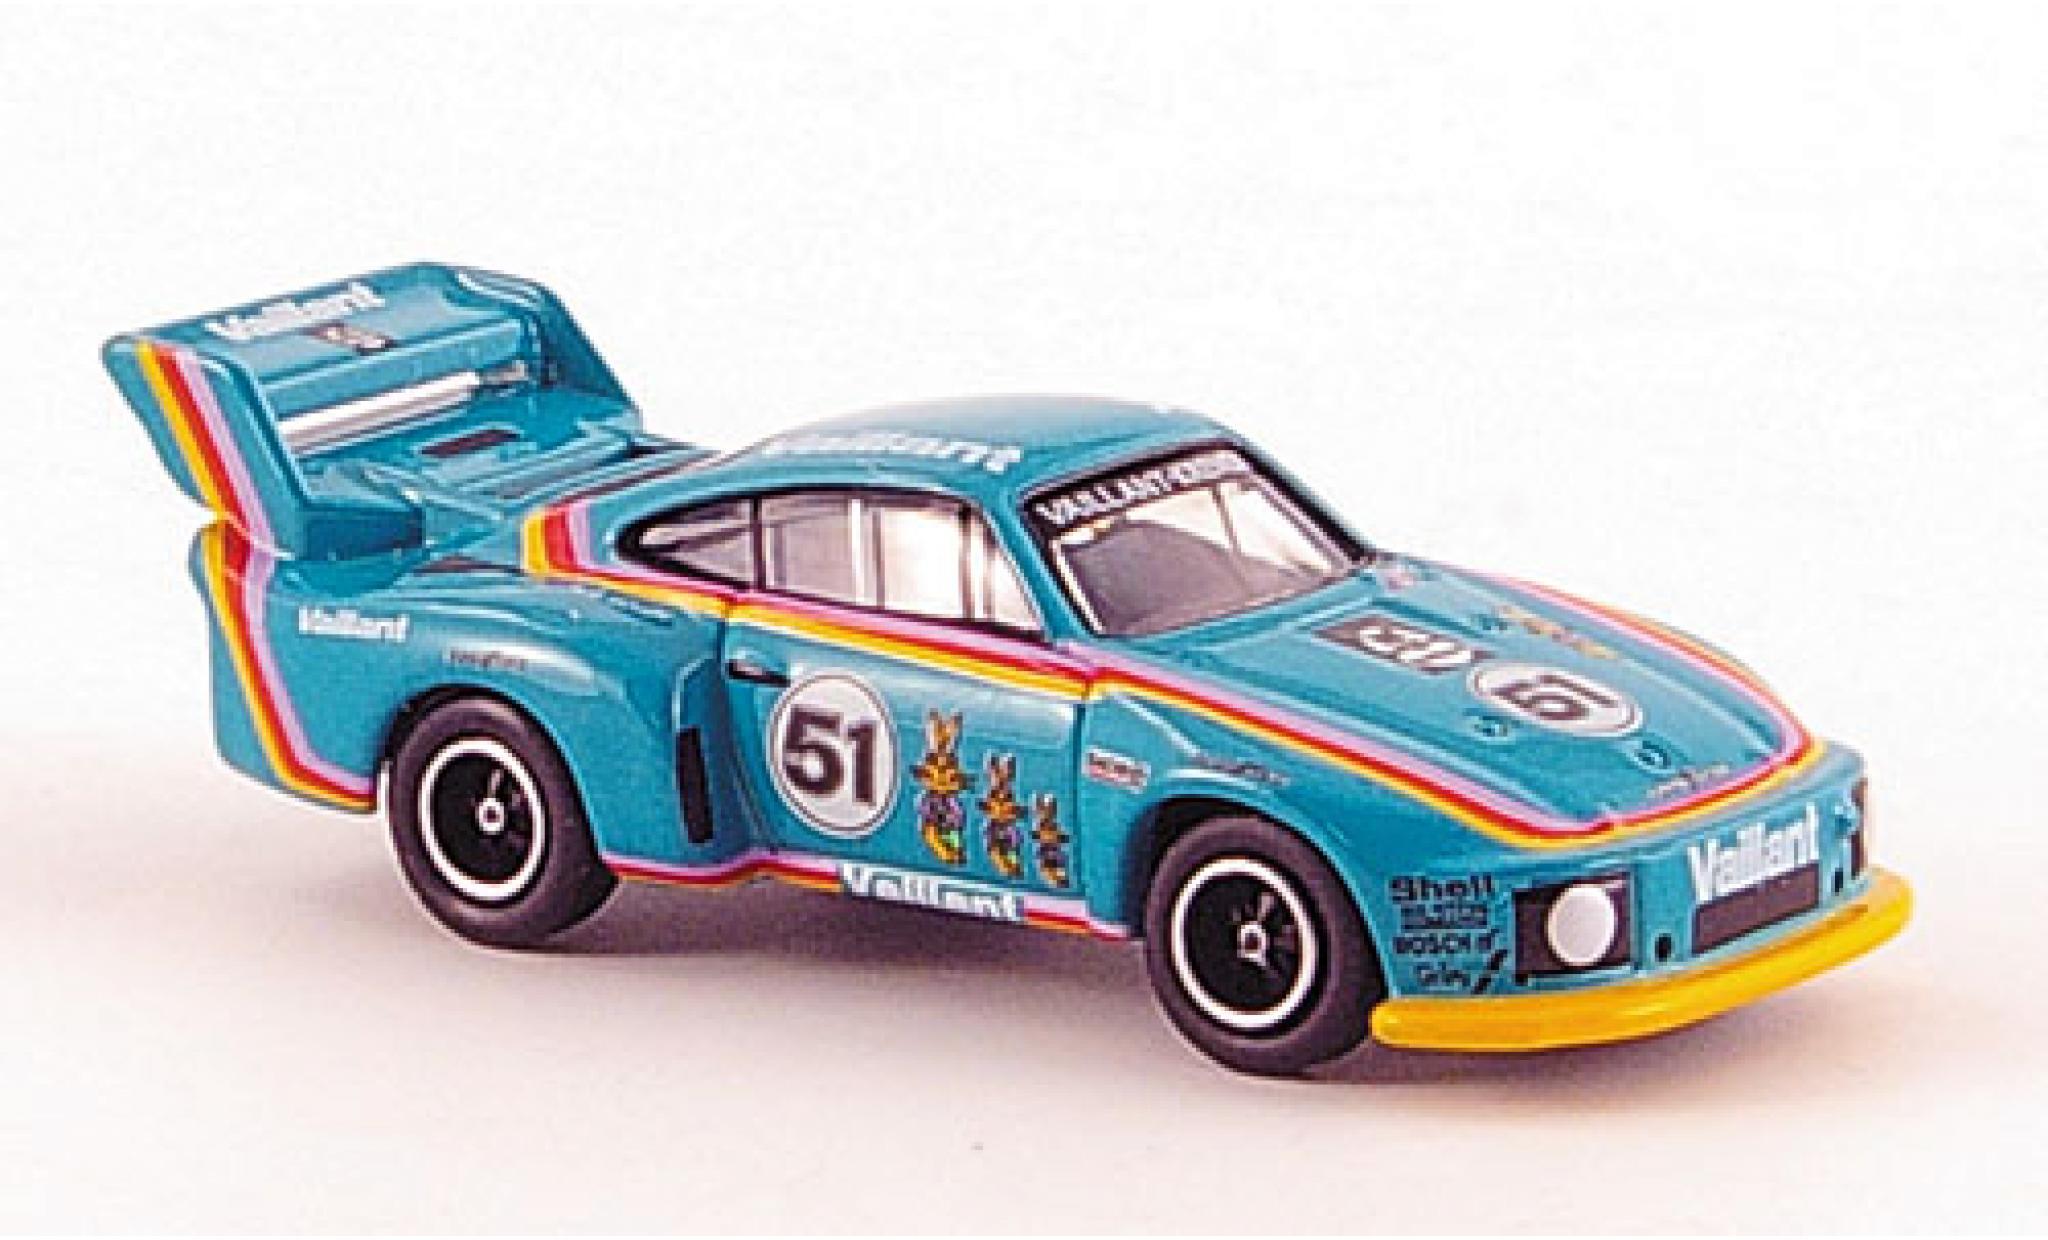 Porsche 935 1/87 Bub Gr.5 No.51 Vaillant